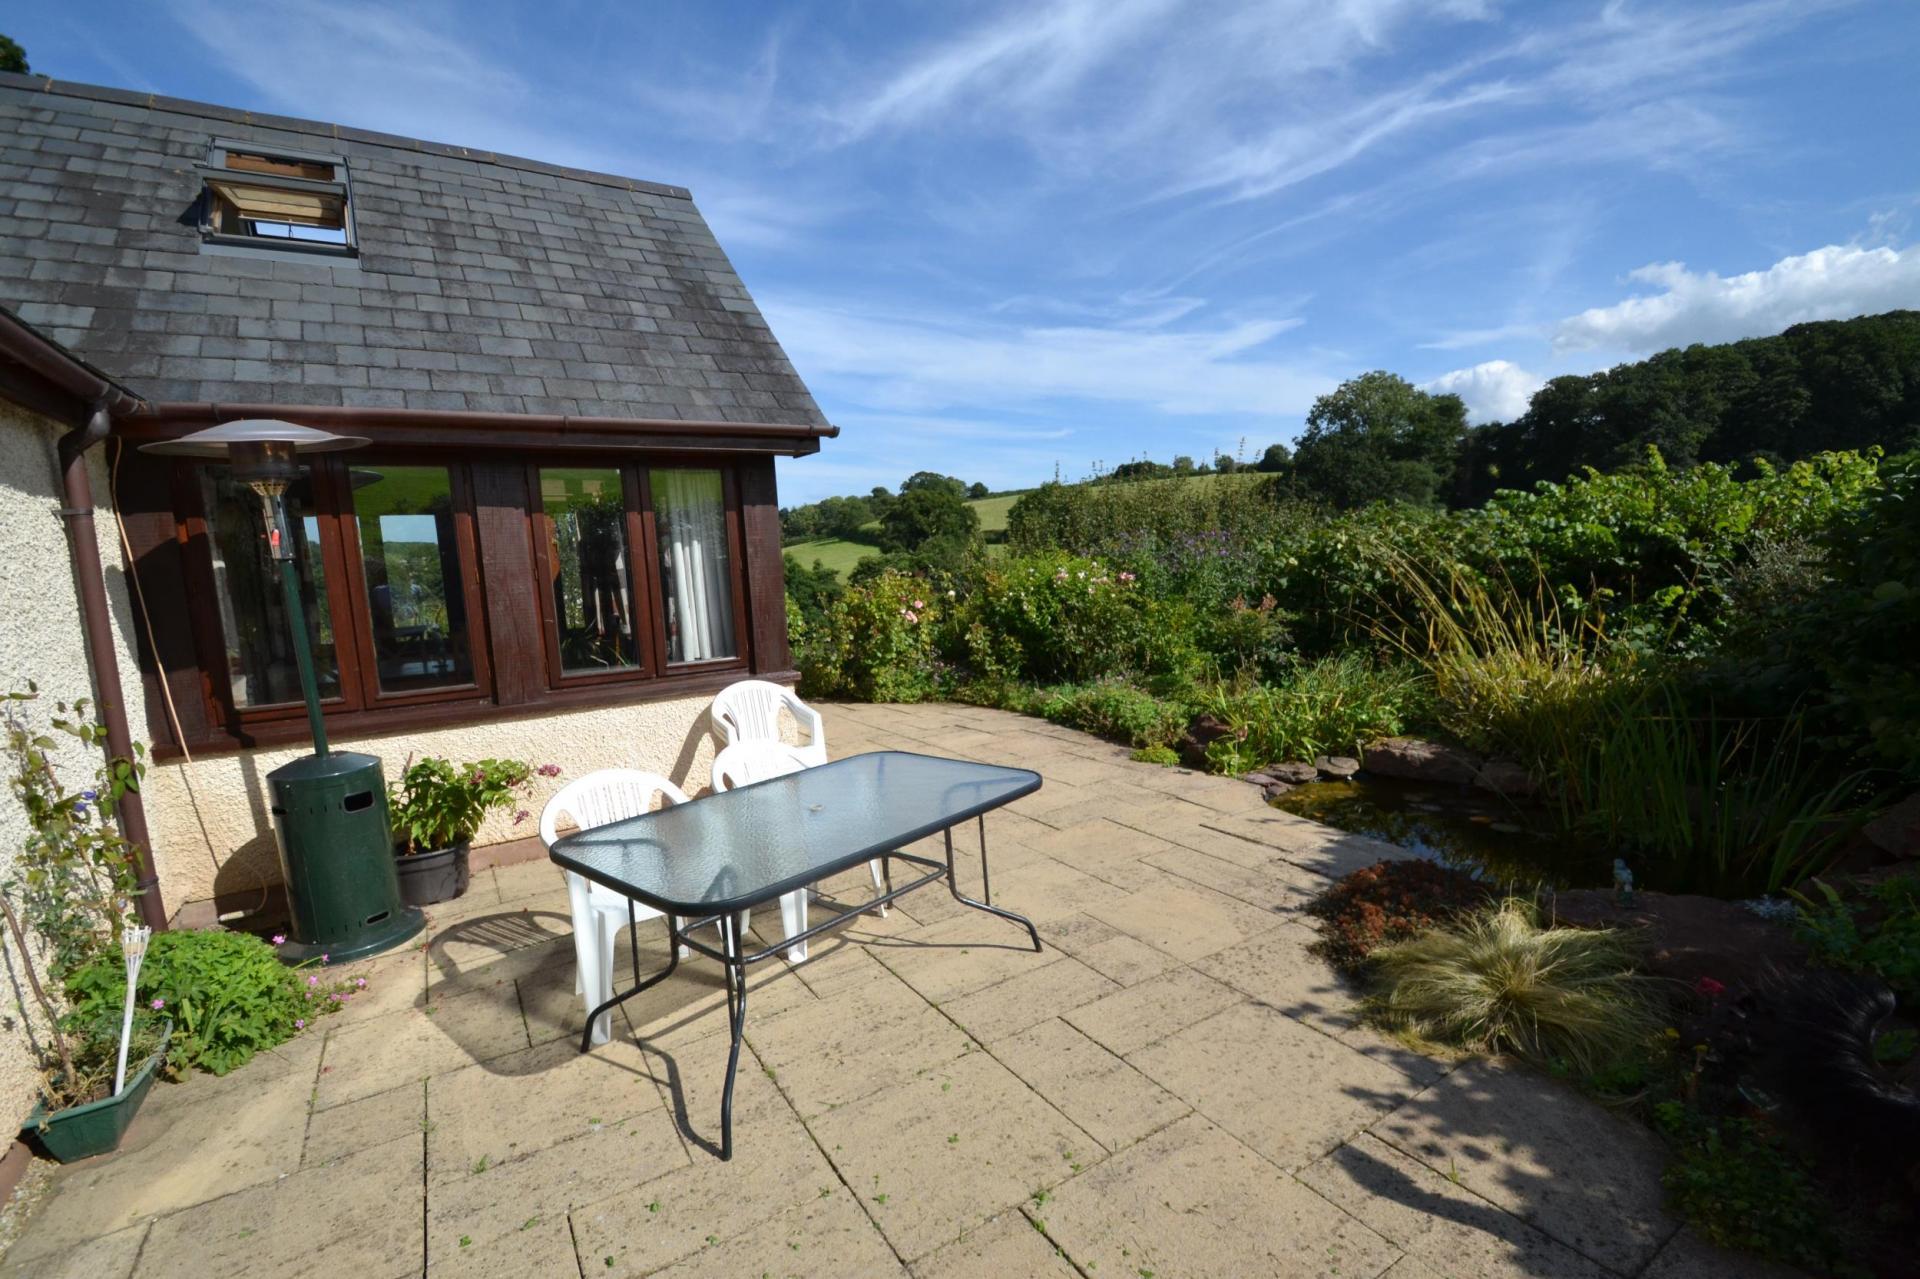 Property For Sale Washford Somerset